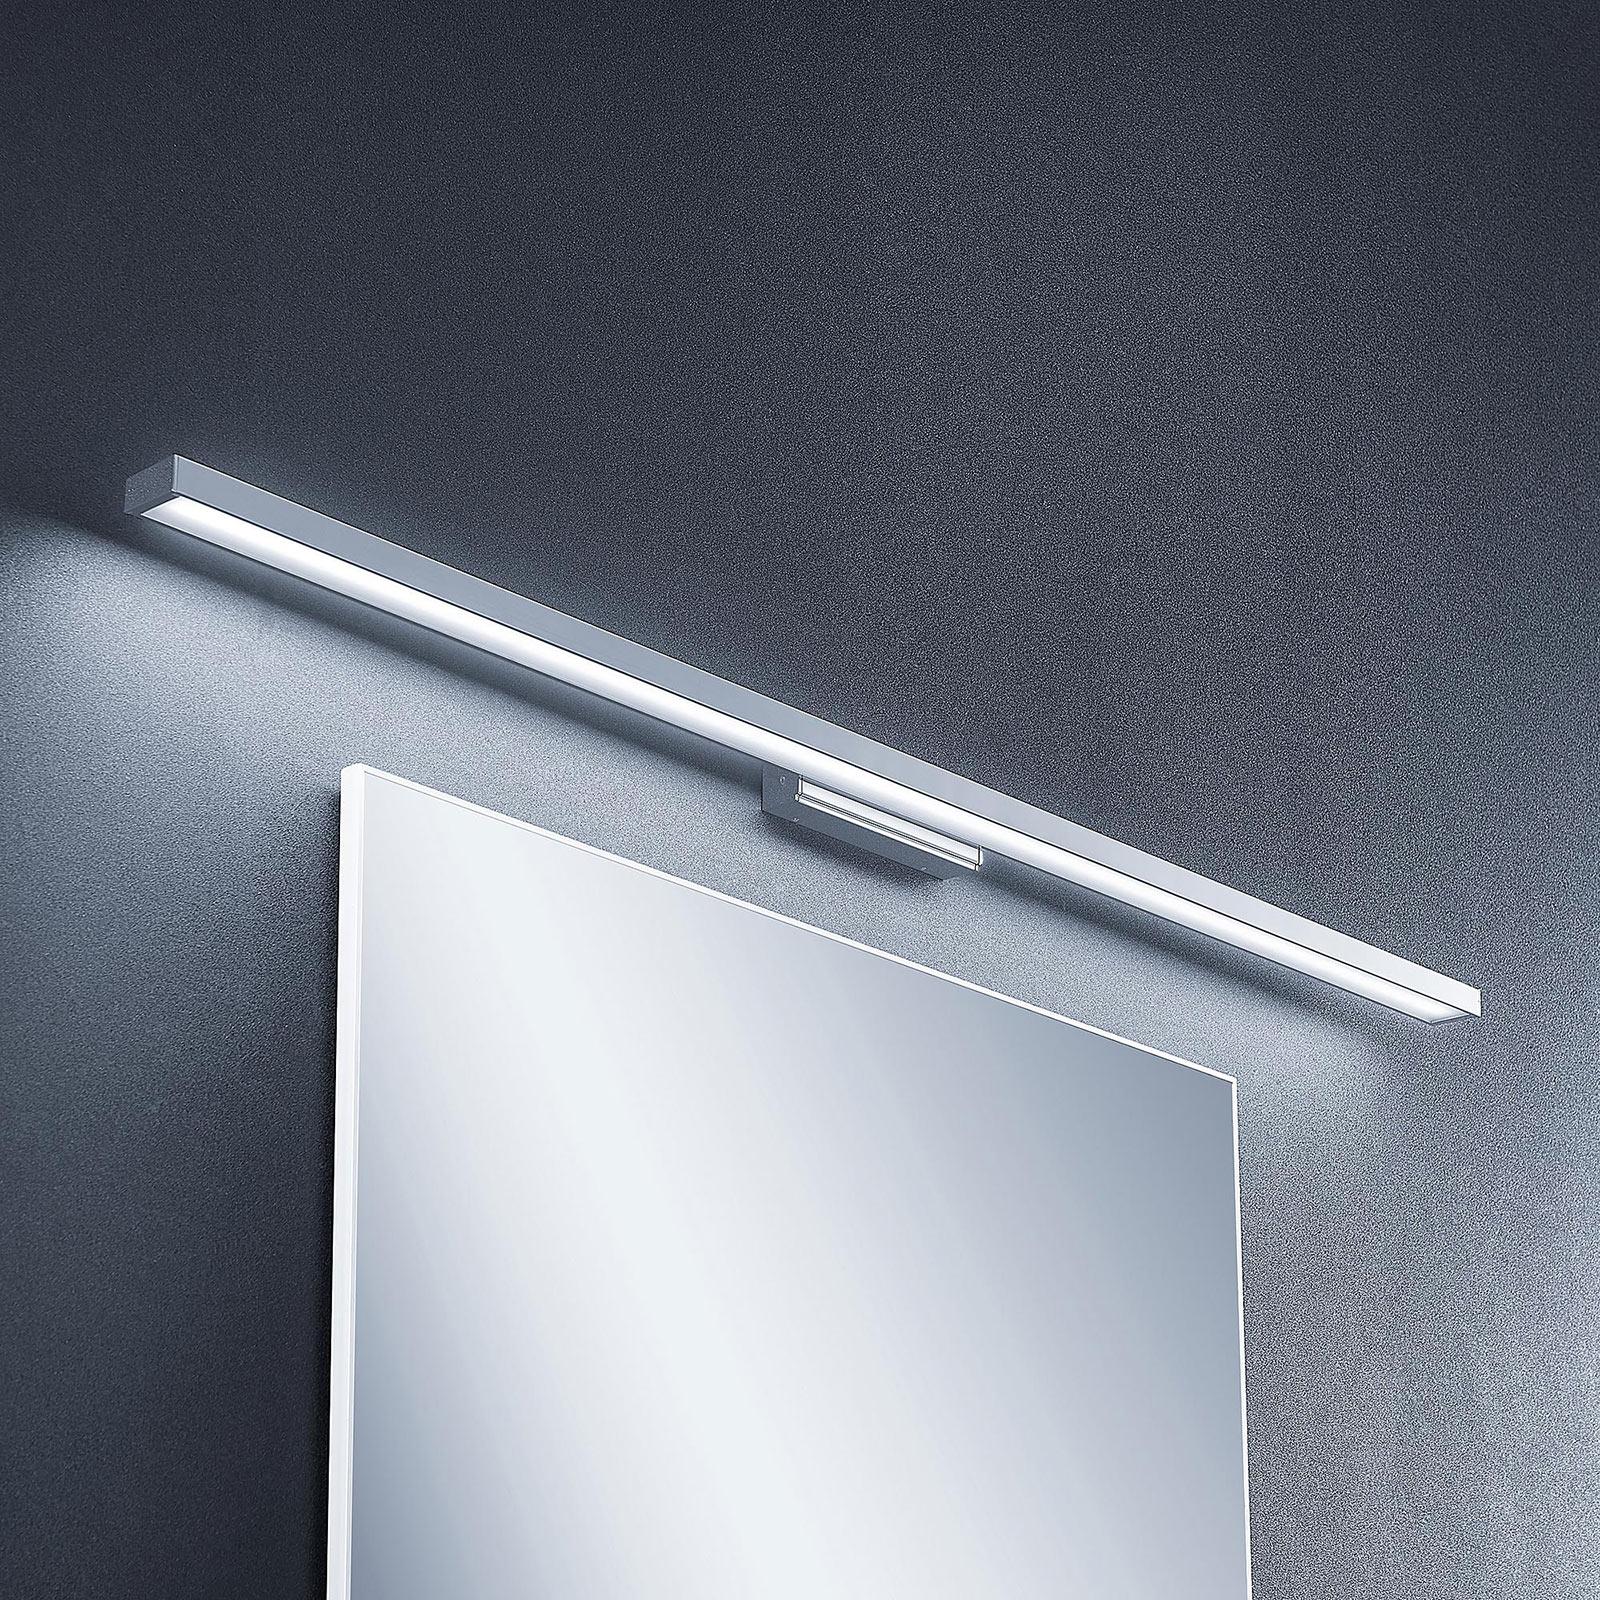 Lindby Alenia LED-speillampe til bad, 120 cm